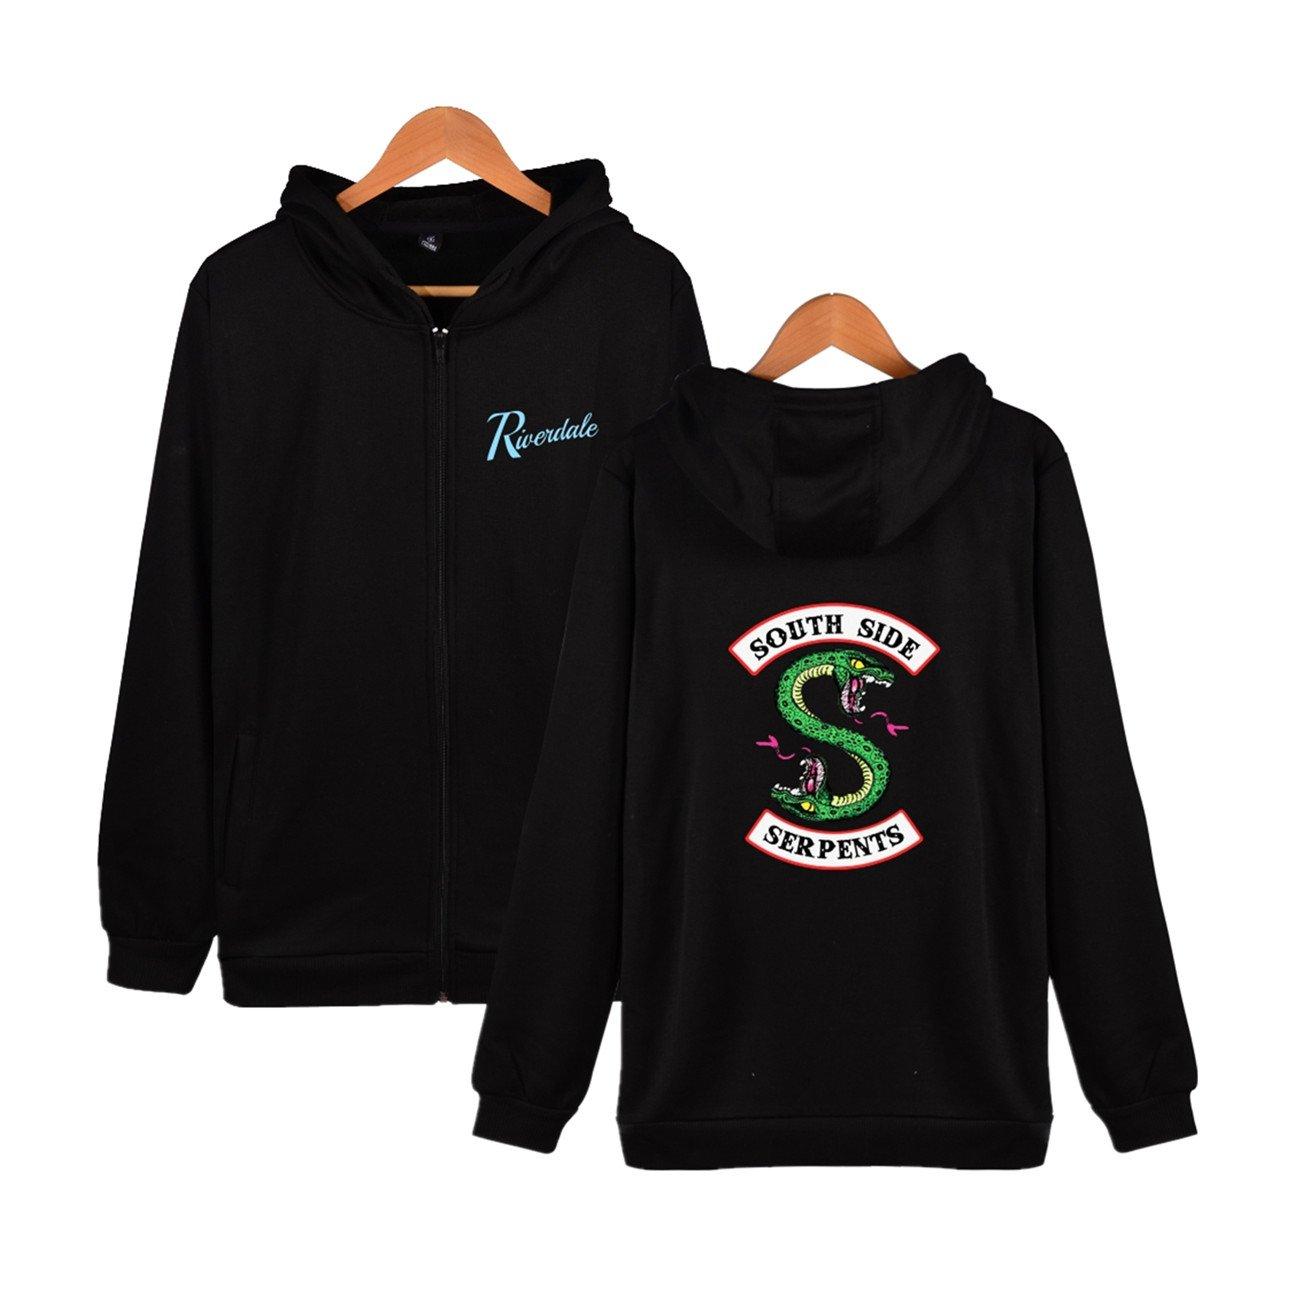 SERAPHY Unisex Riverdale Hoodie Southside Serpents Printed Outerwear Zipper Jacket Sweaters-Black-M